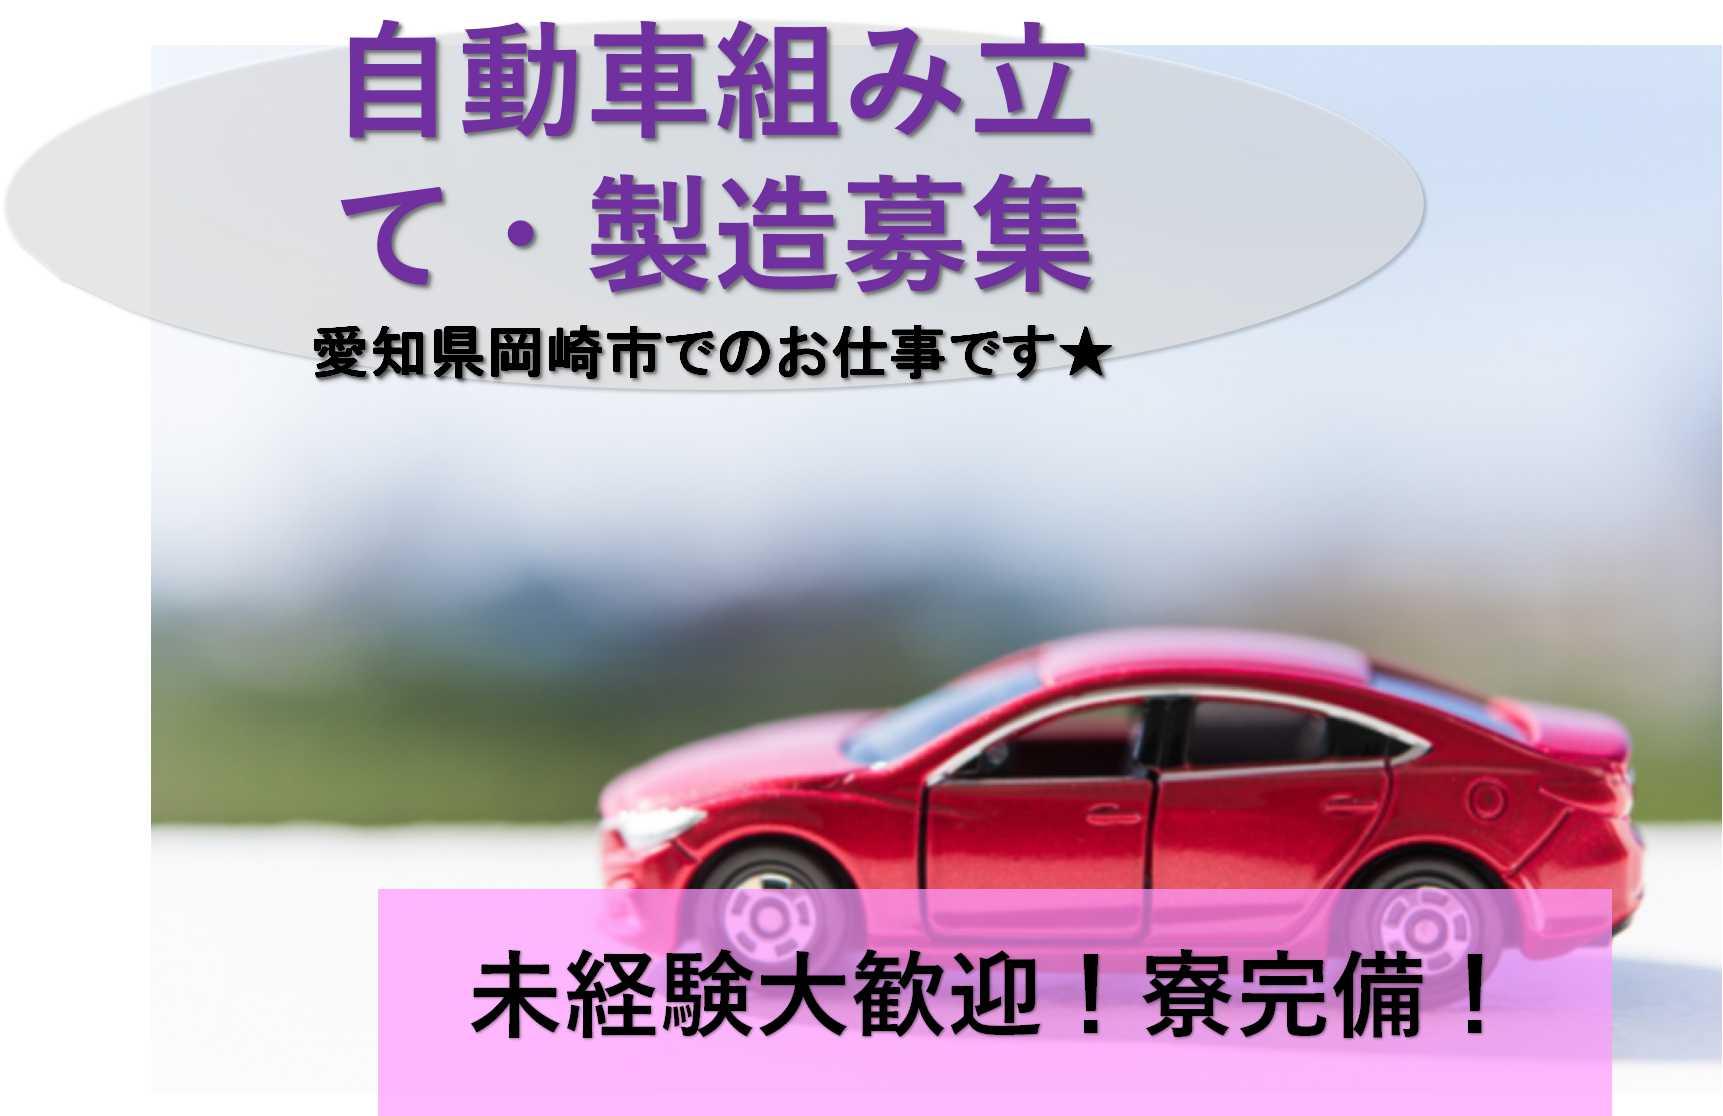 【研修充実】岡崎市勤務!寮完備◎自動車組み立て・製造【即面談可能】 イメージ